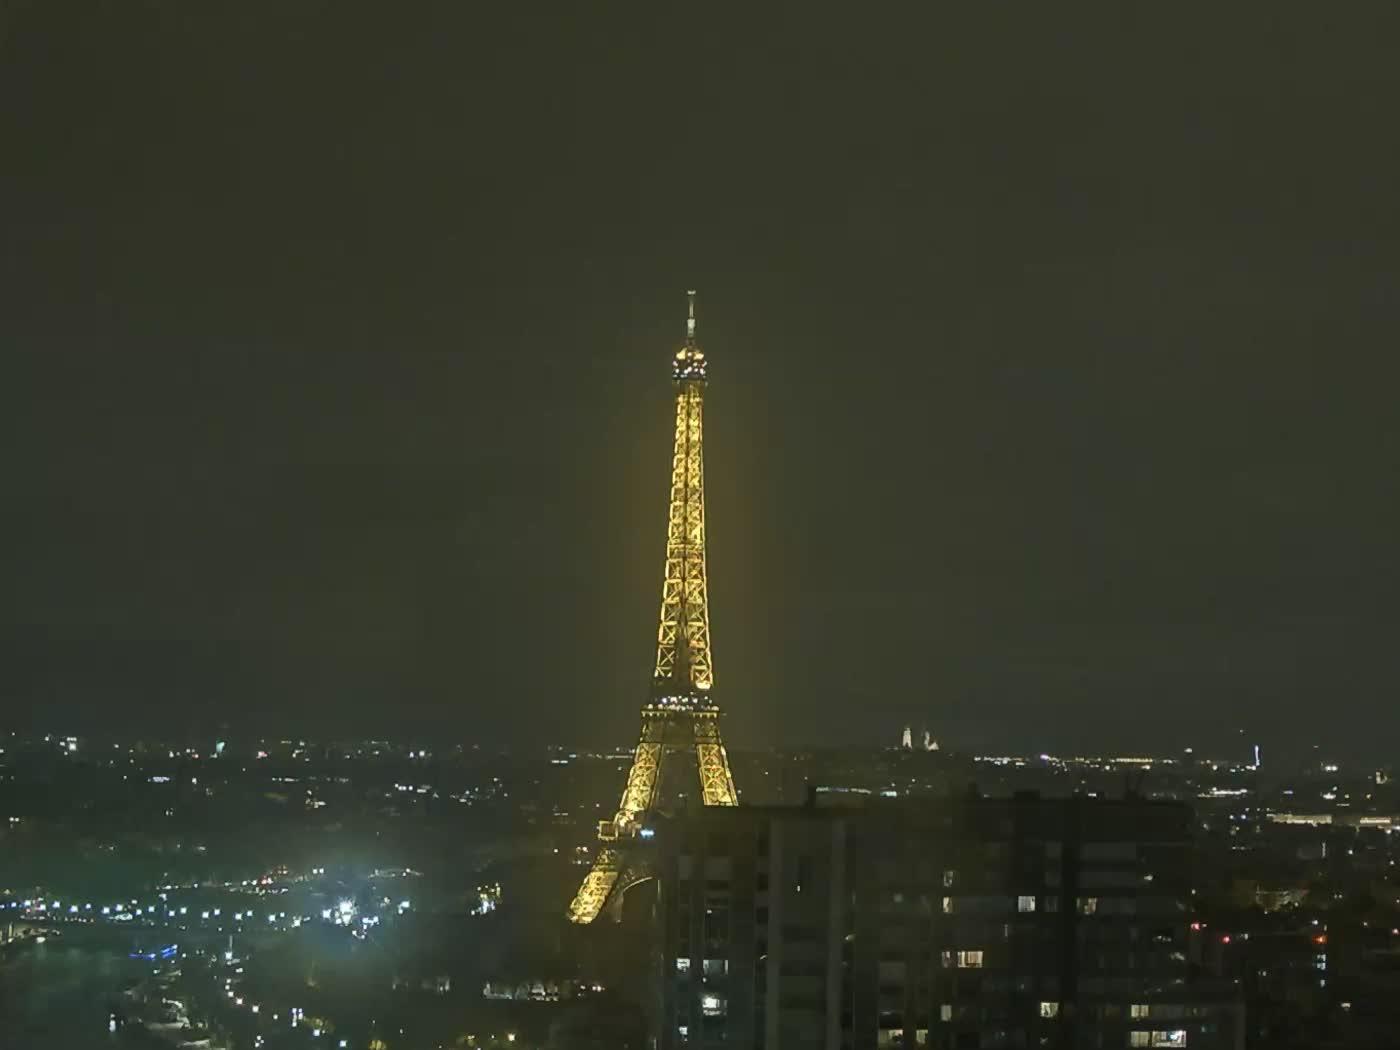 Paris Thu. 23:22